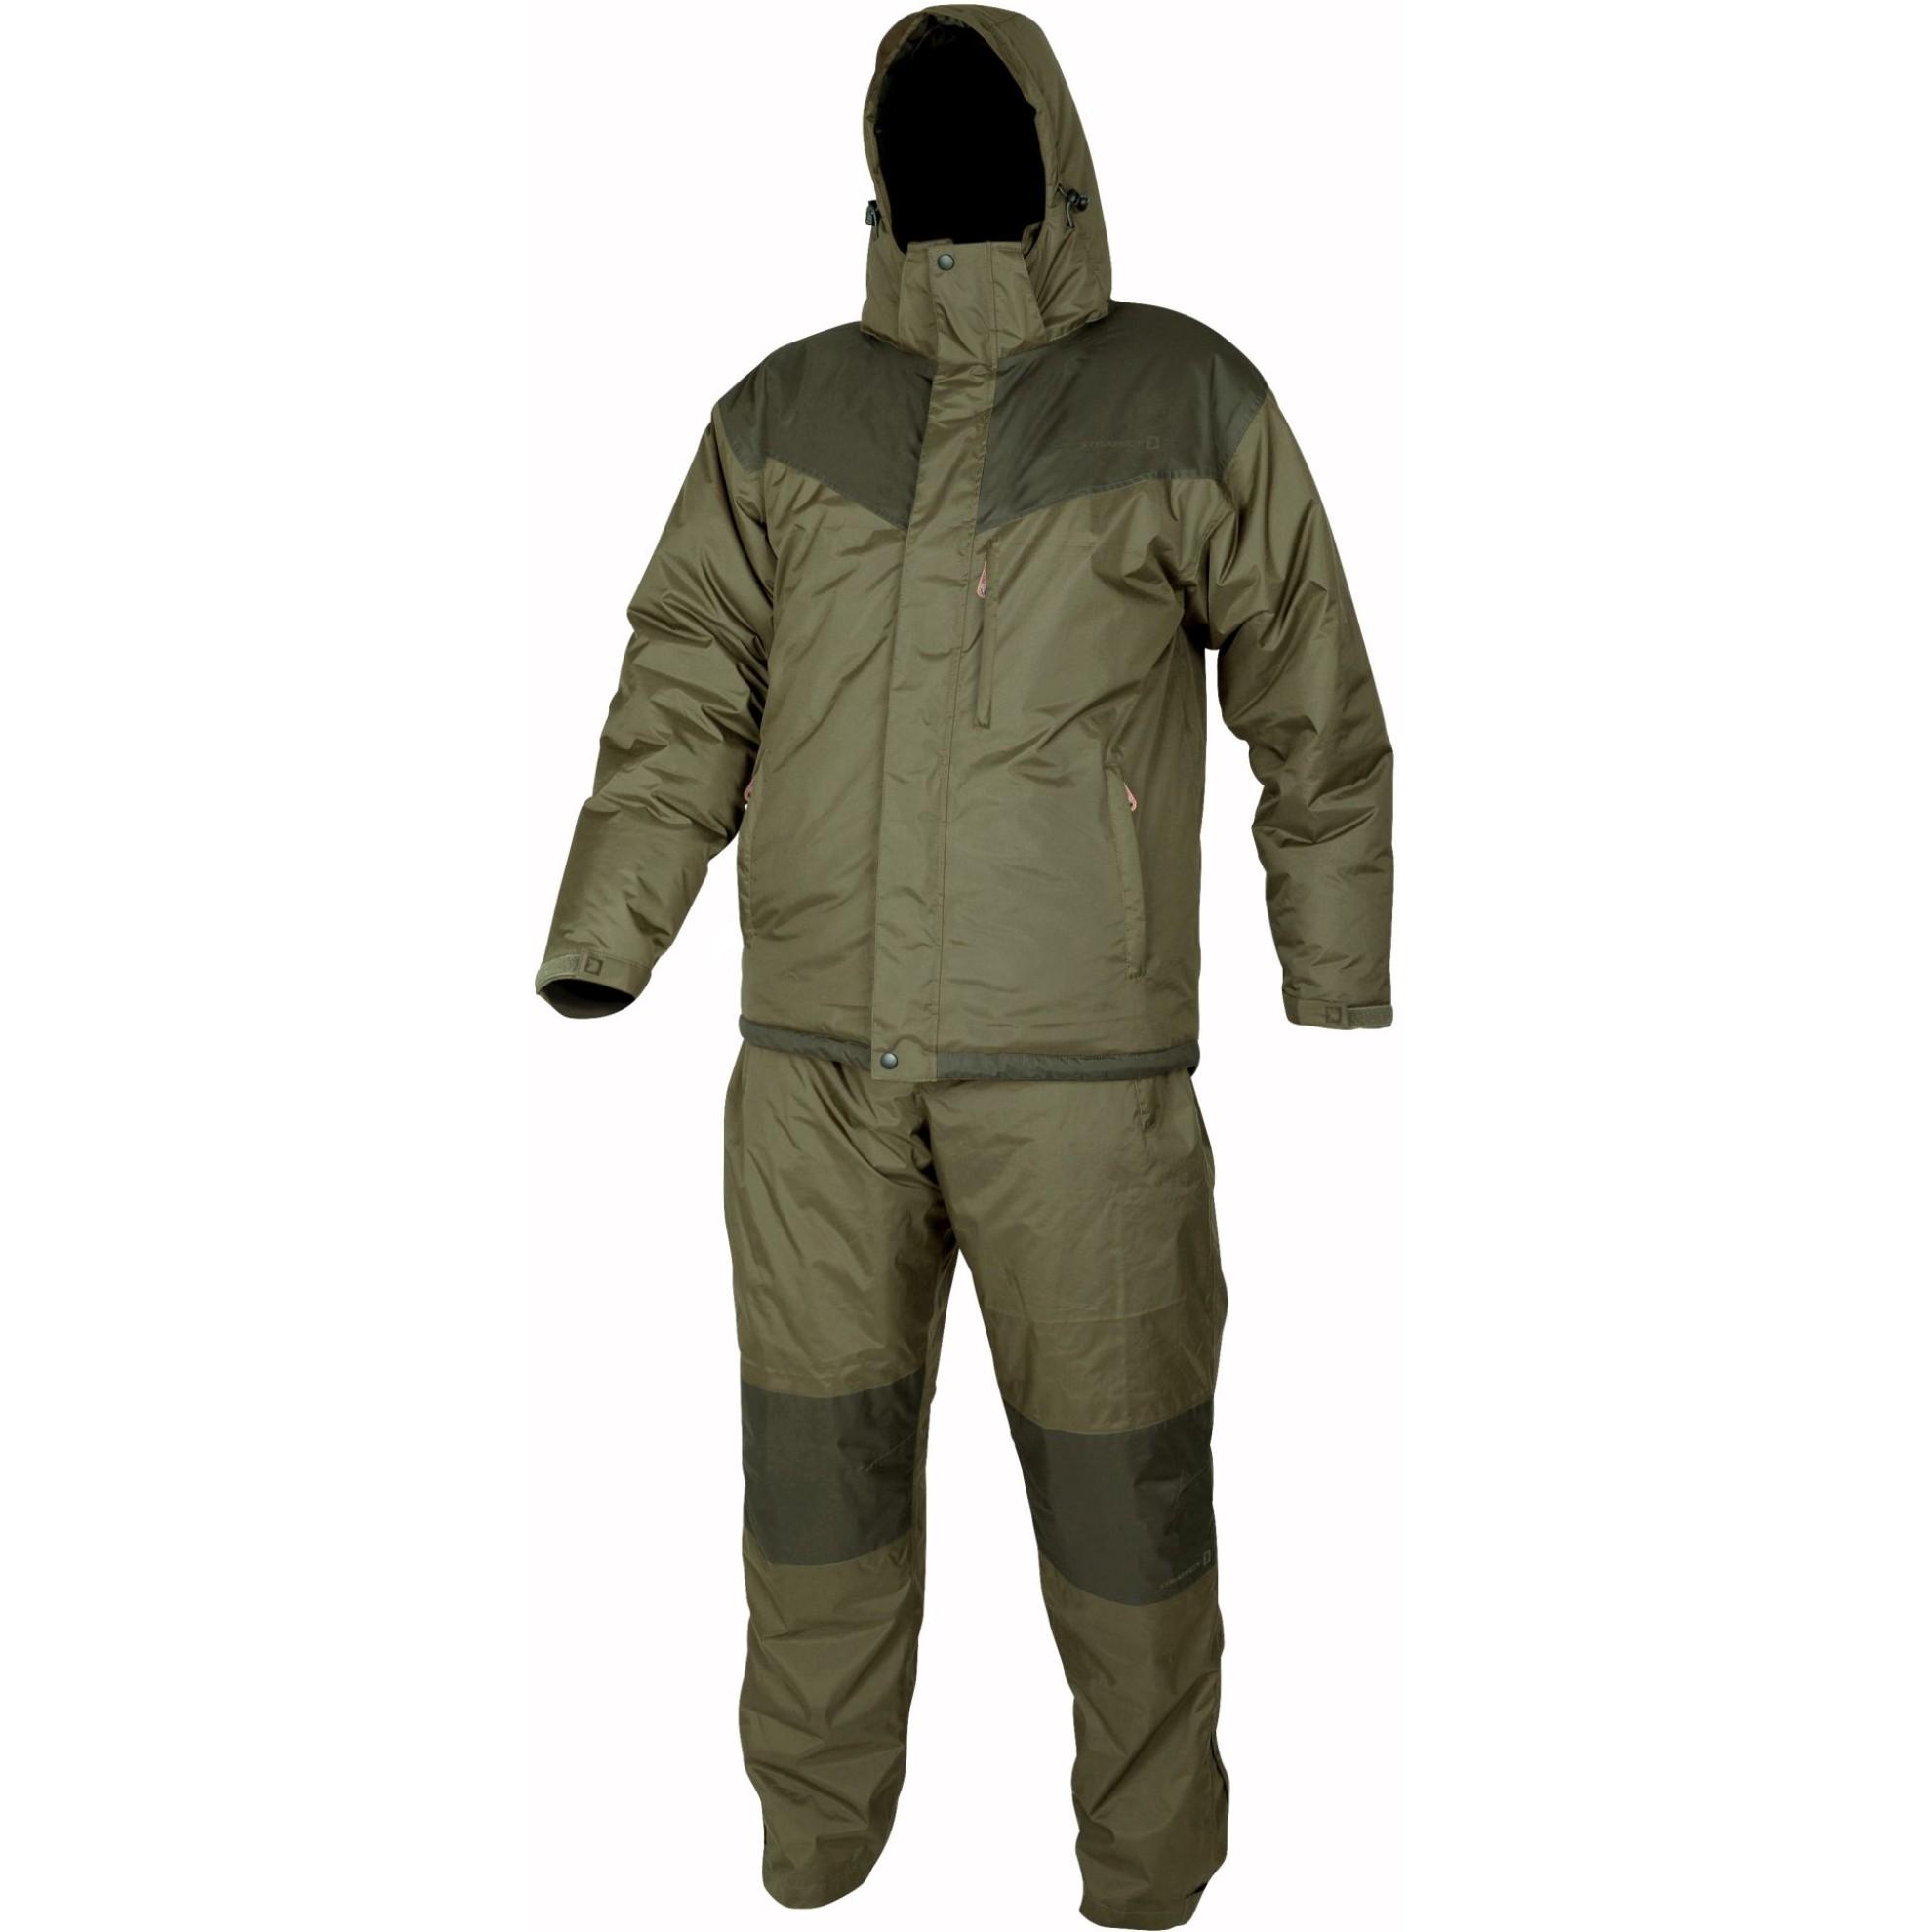 Quantum Winter Suit Gr M Angelbekleidung Thermoanzug